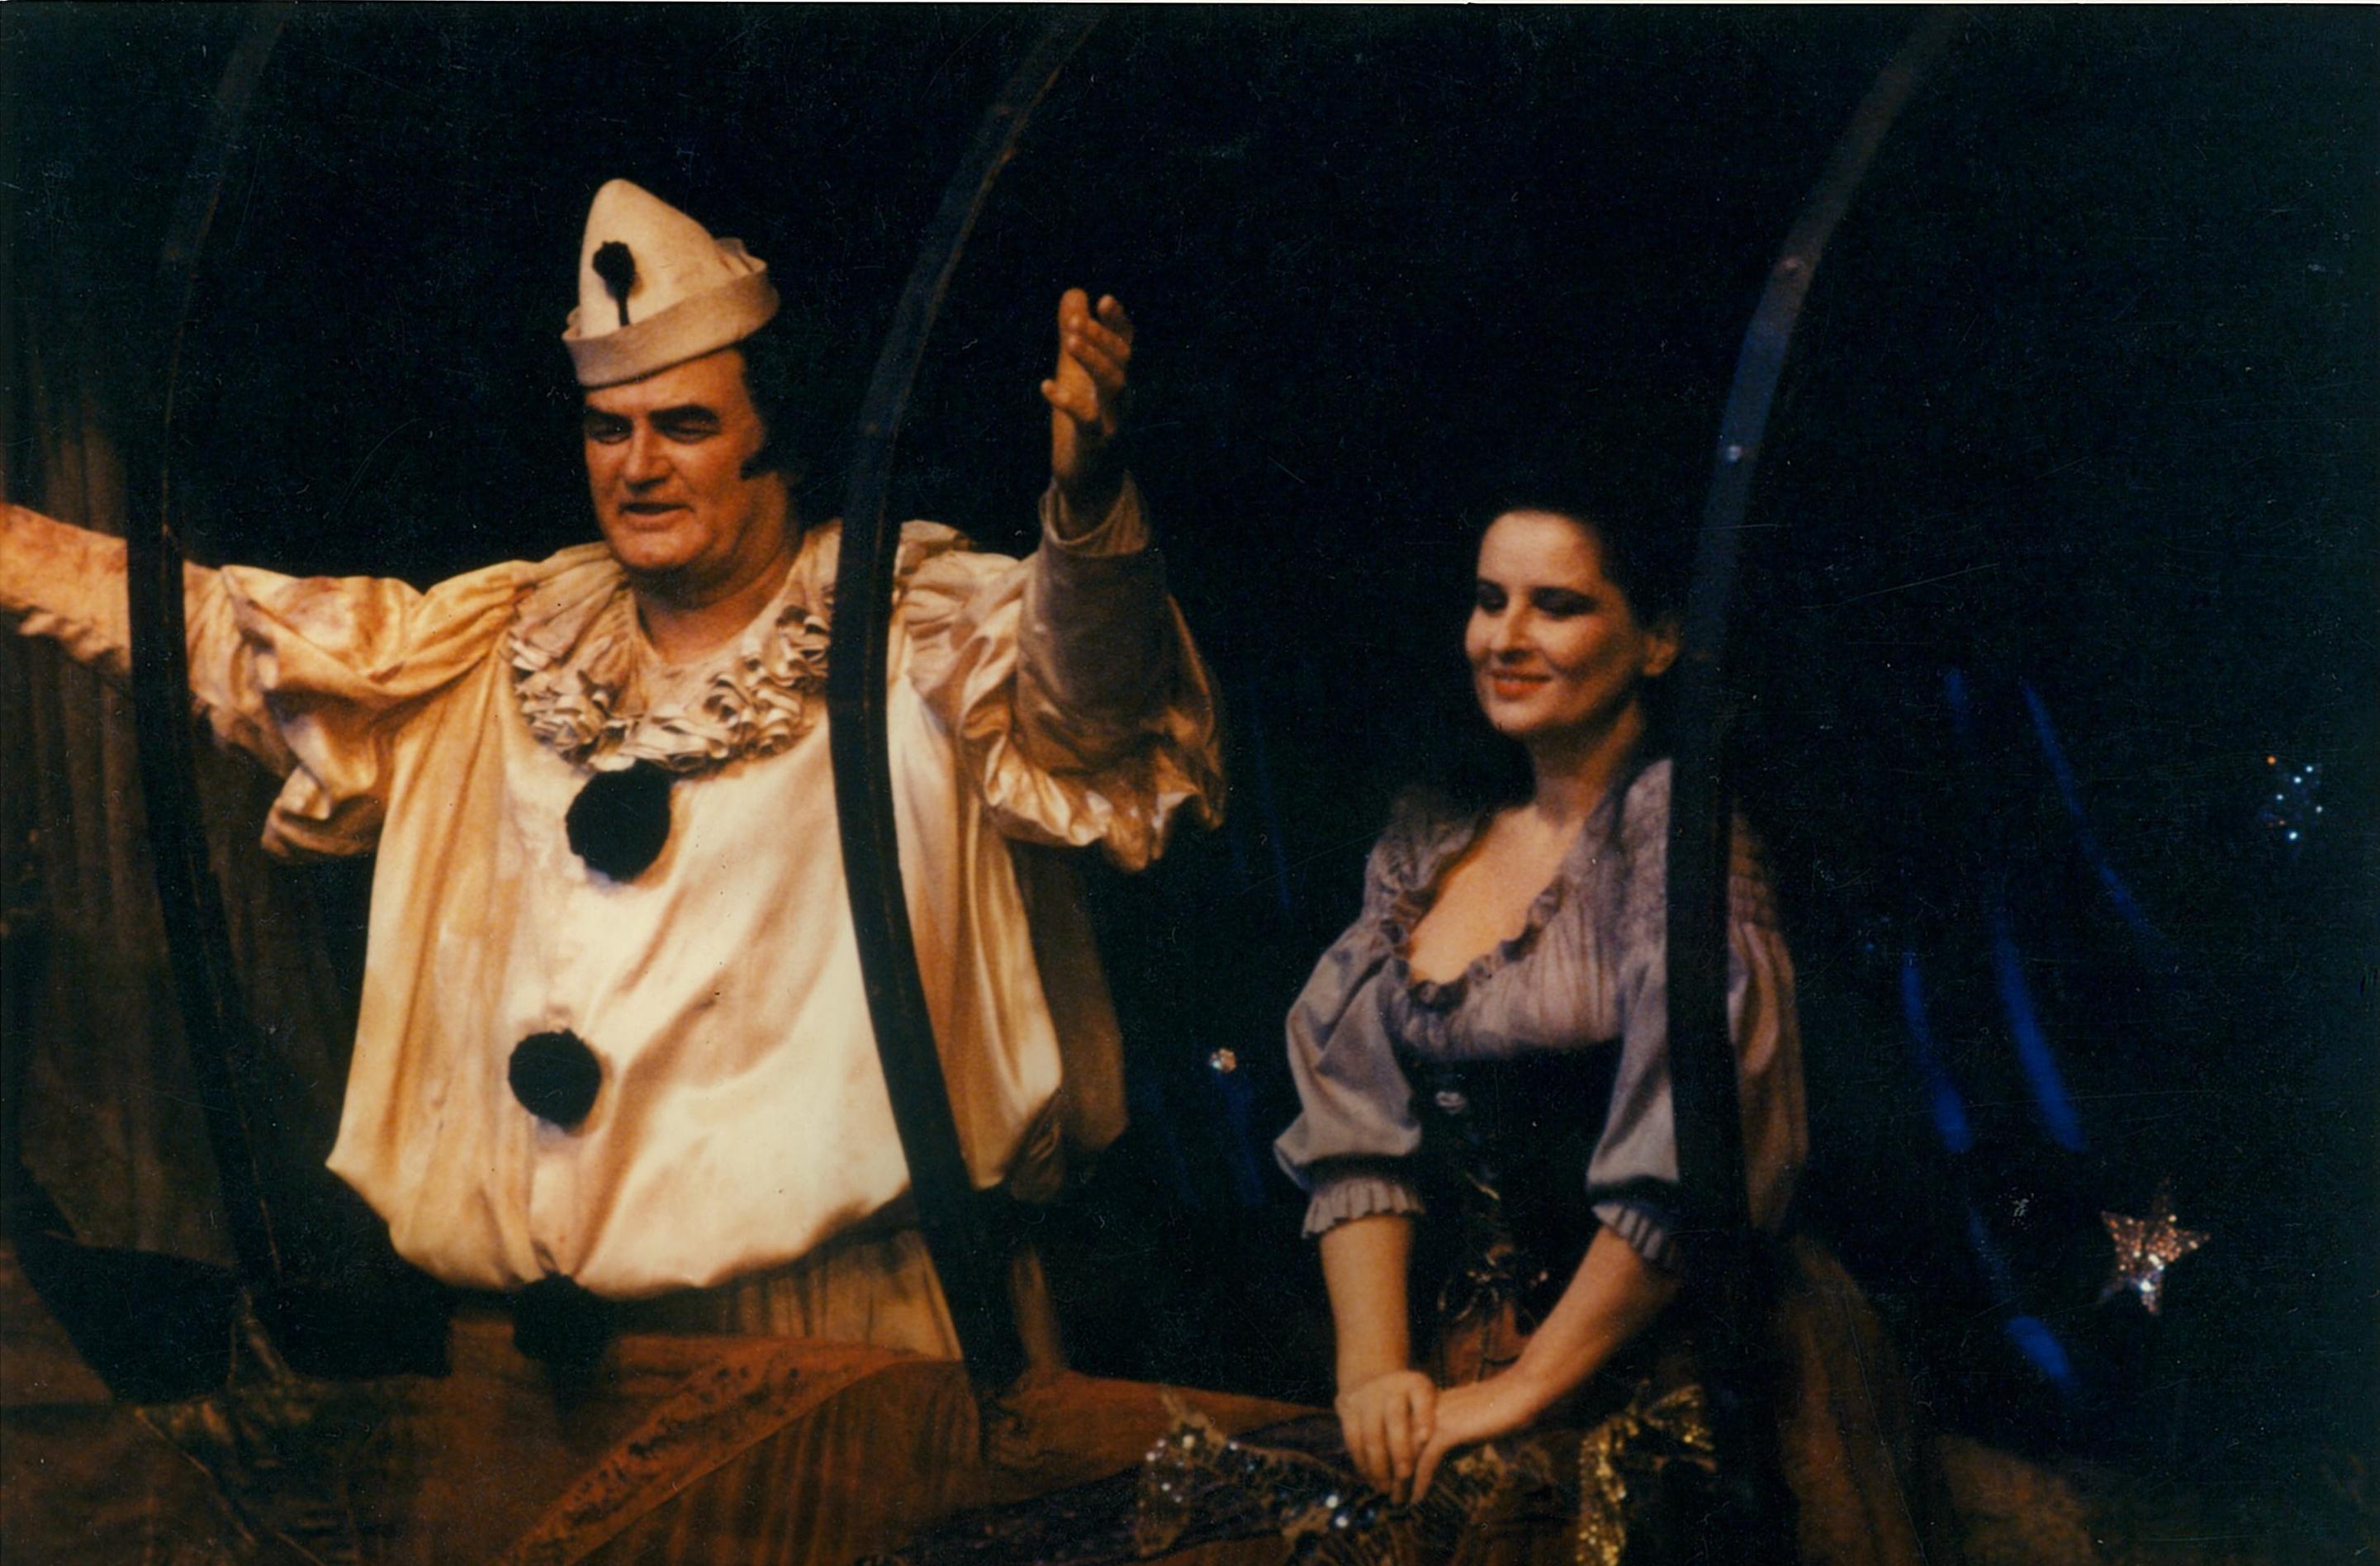 Cu marele tenor John Vickers, Canio, Mariana Nicolesco în rolul Nedda dinI Pagliacci de Leoncavallo. Metropolitan Opera, New York